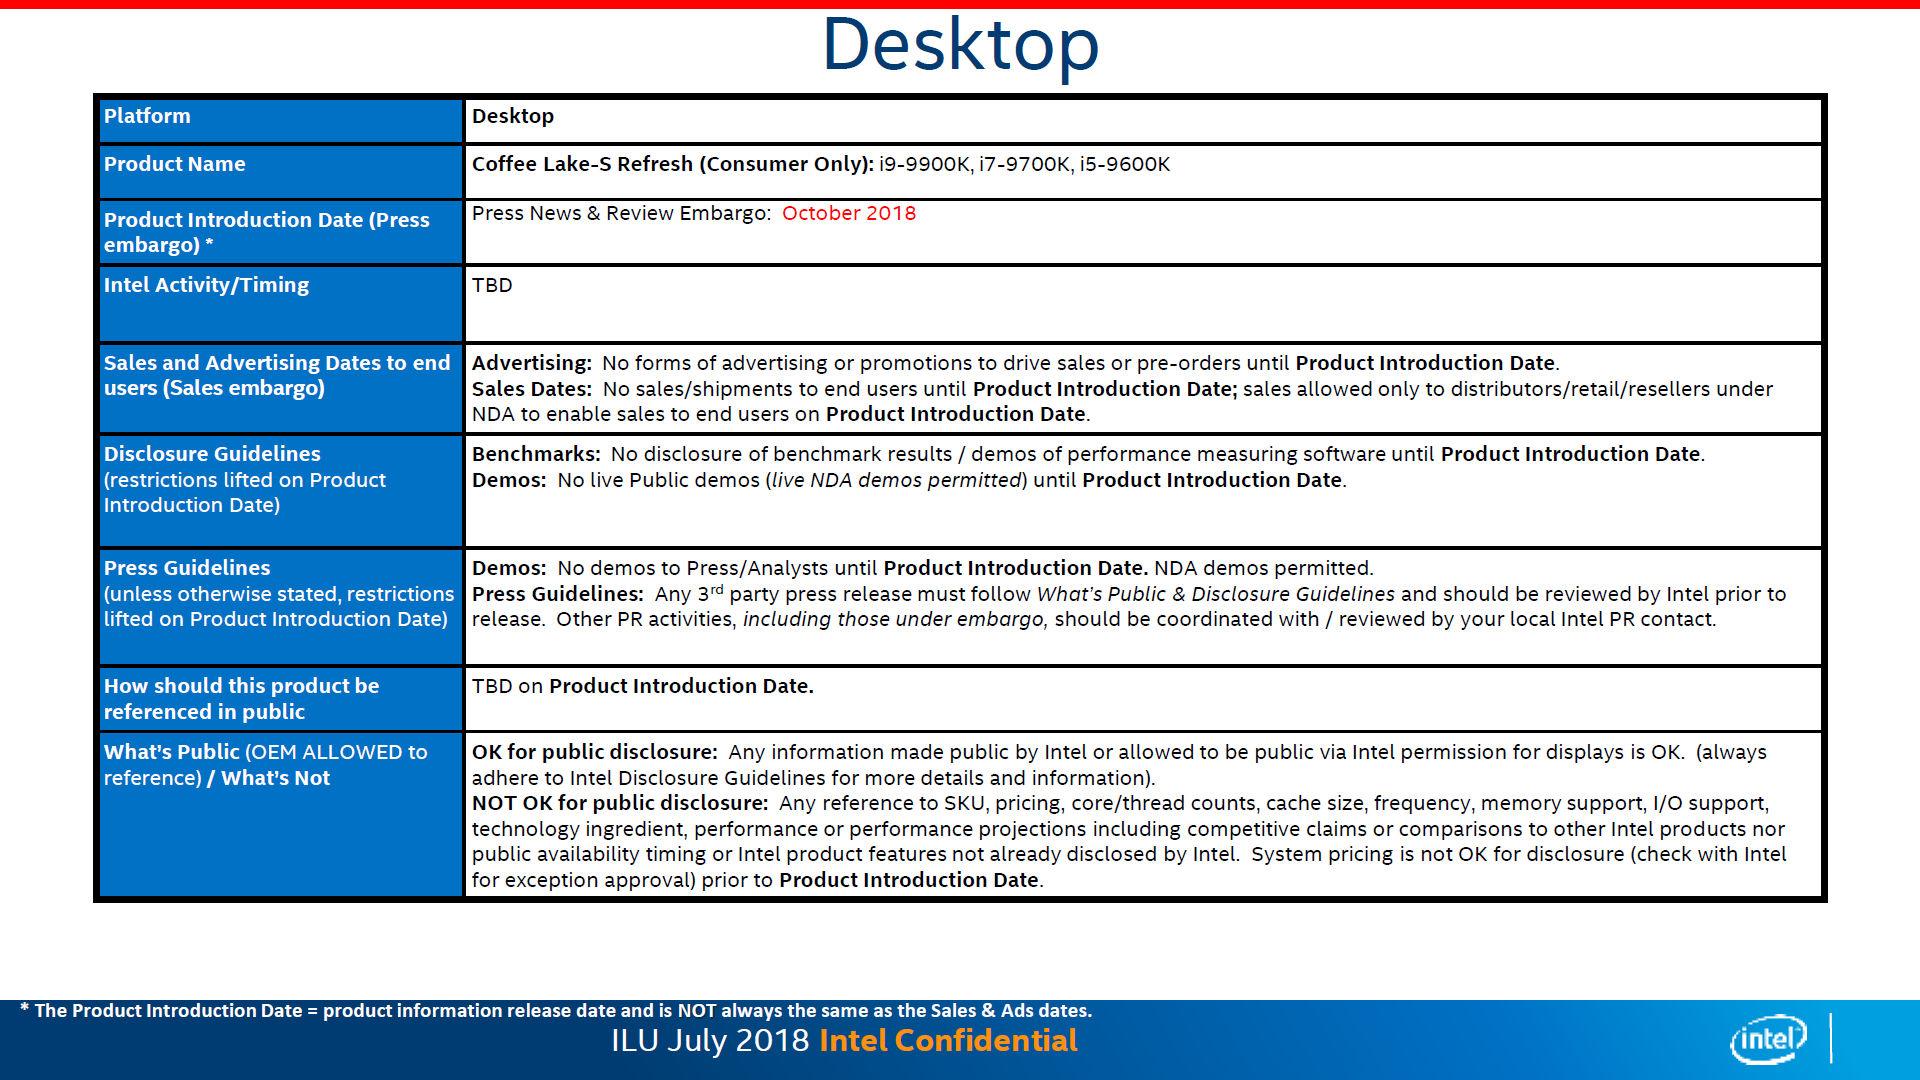 Lastest Roadmap: Intel Core i9-9900K, i7-9700K and i5-9600K